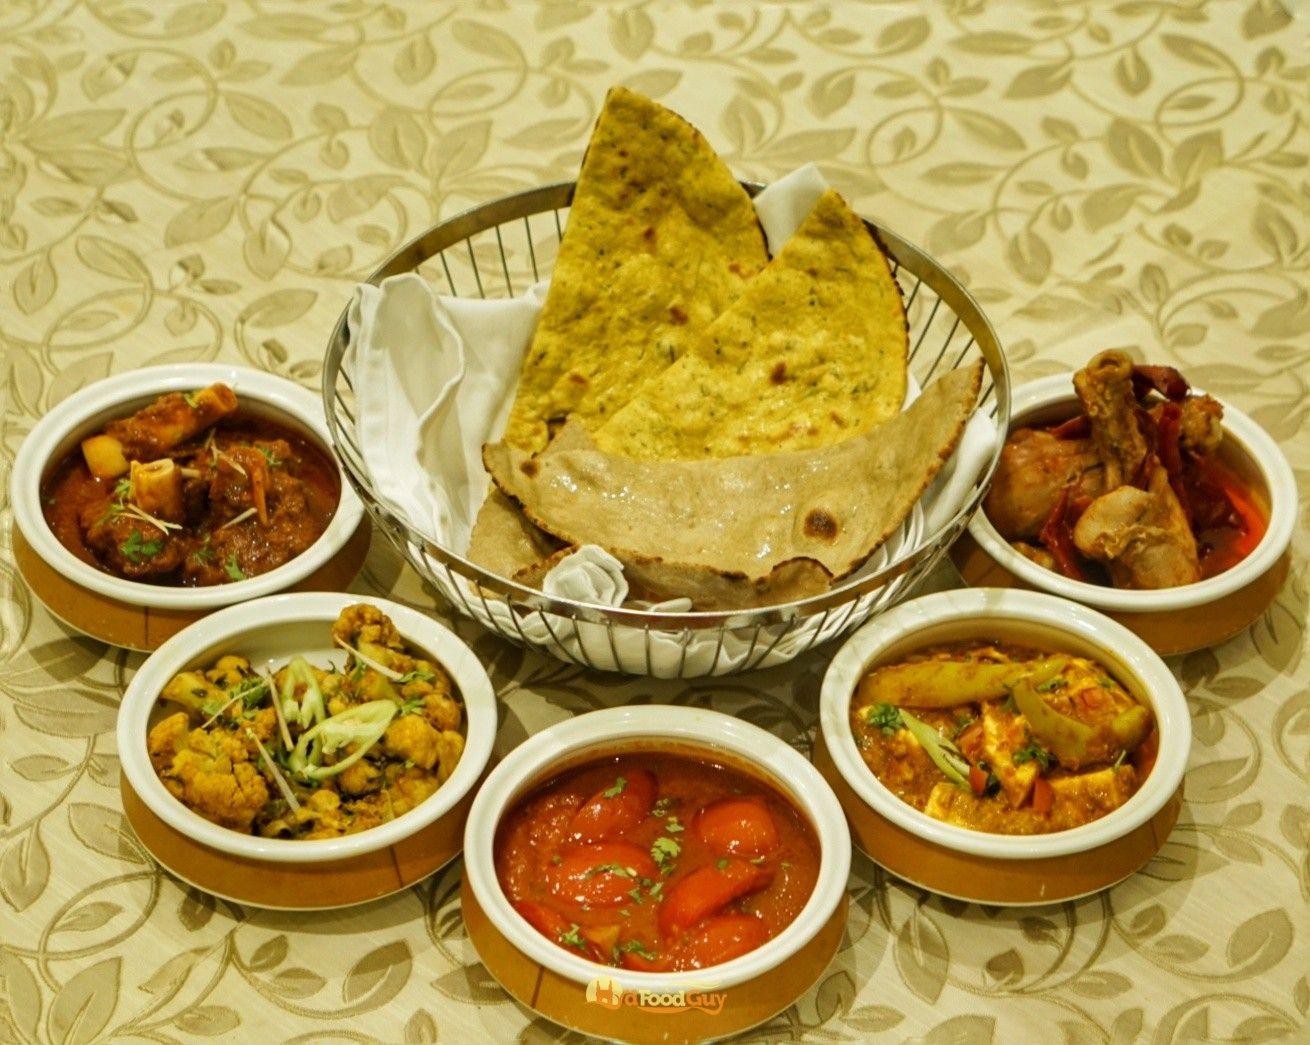 ITC Kakatiya - Rajasthani Food